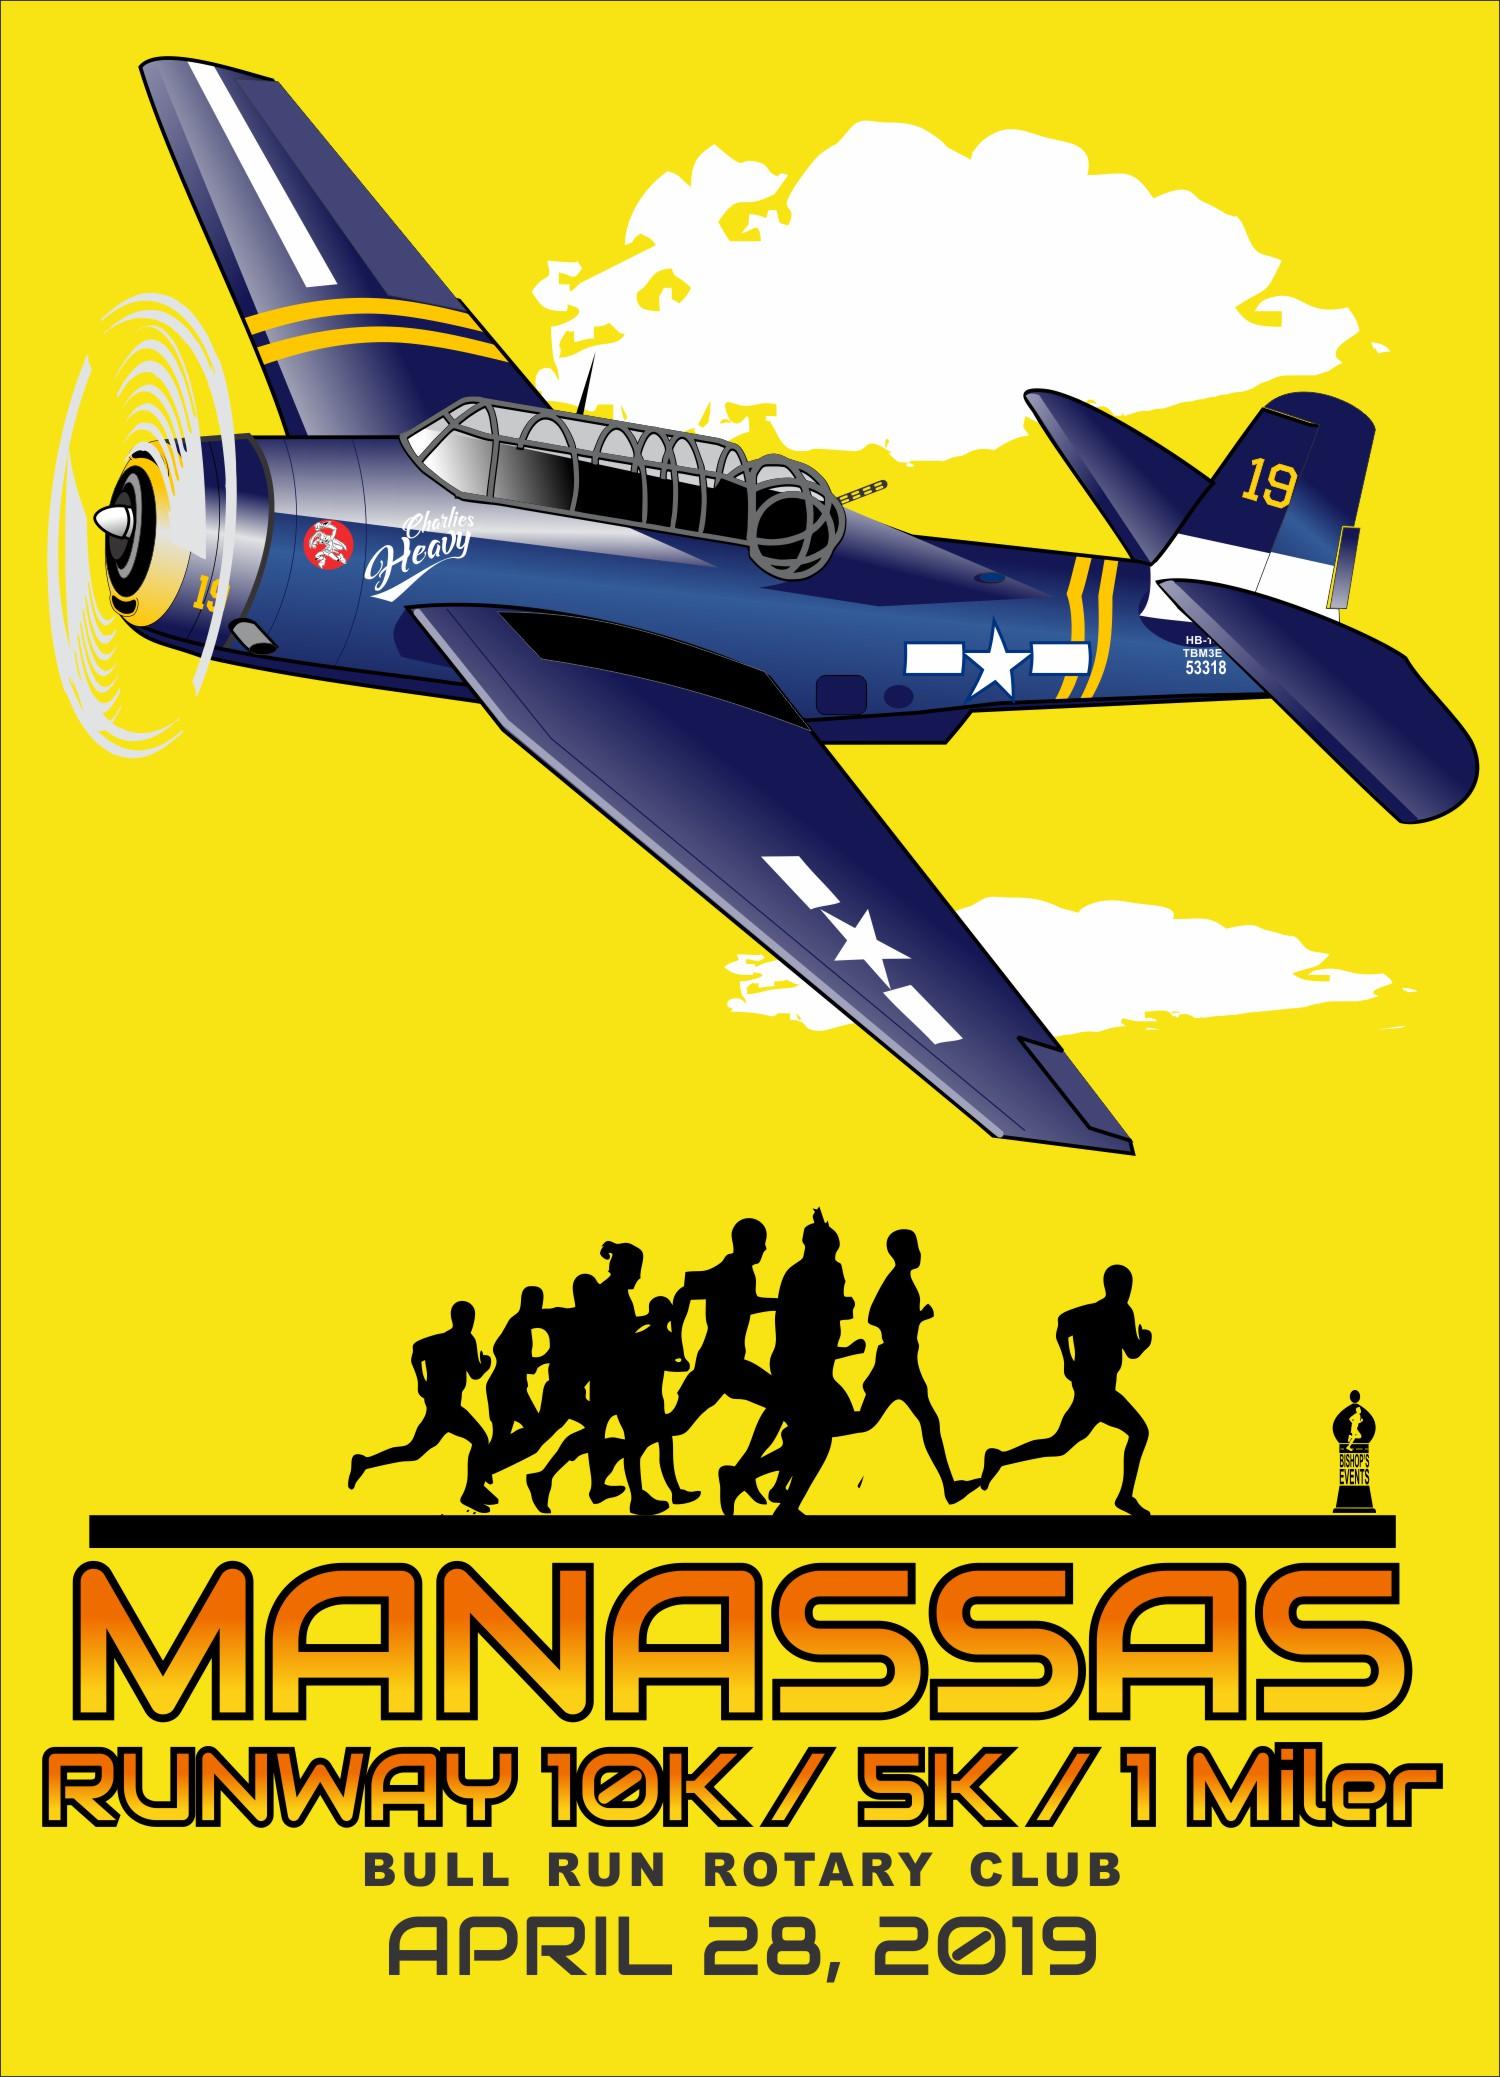 2019 Manassas Runway 5k, 10k, & 1M